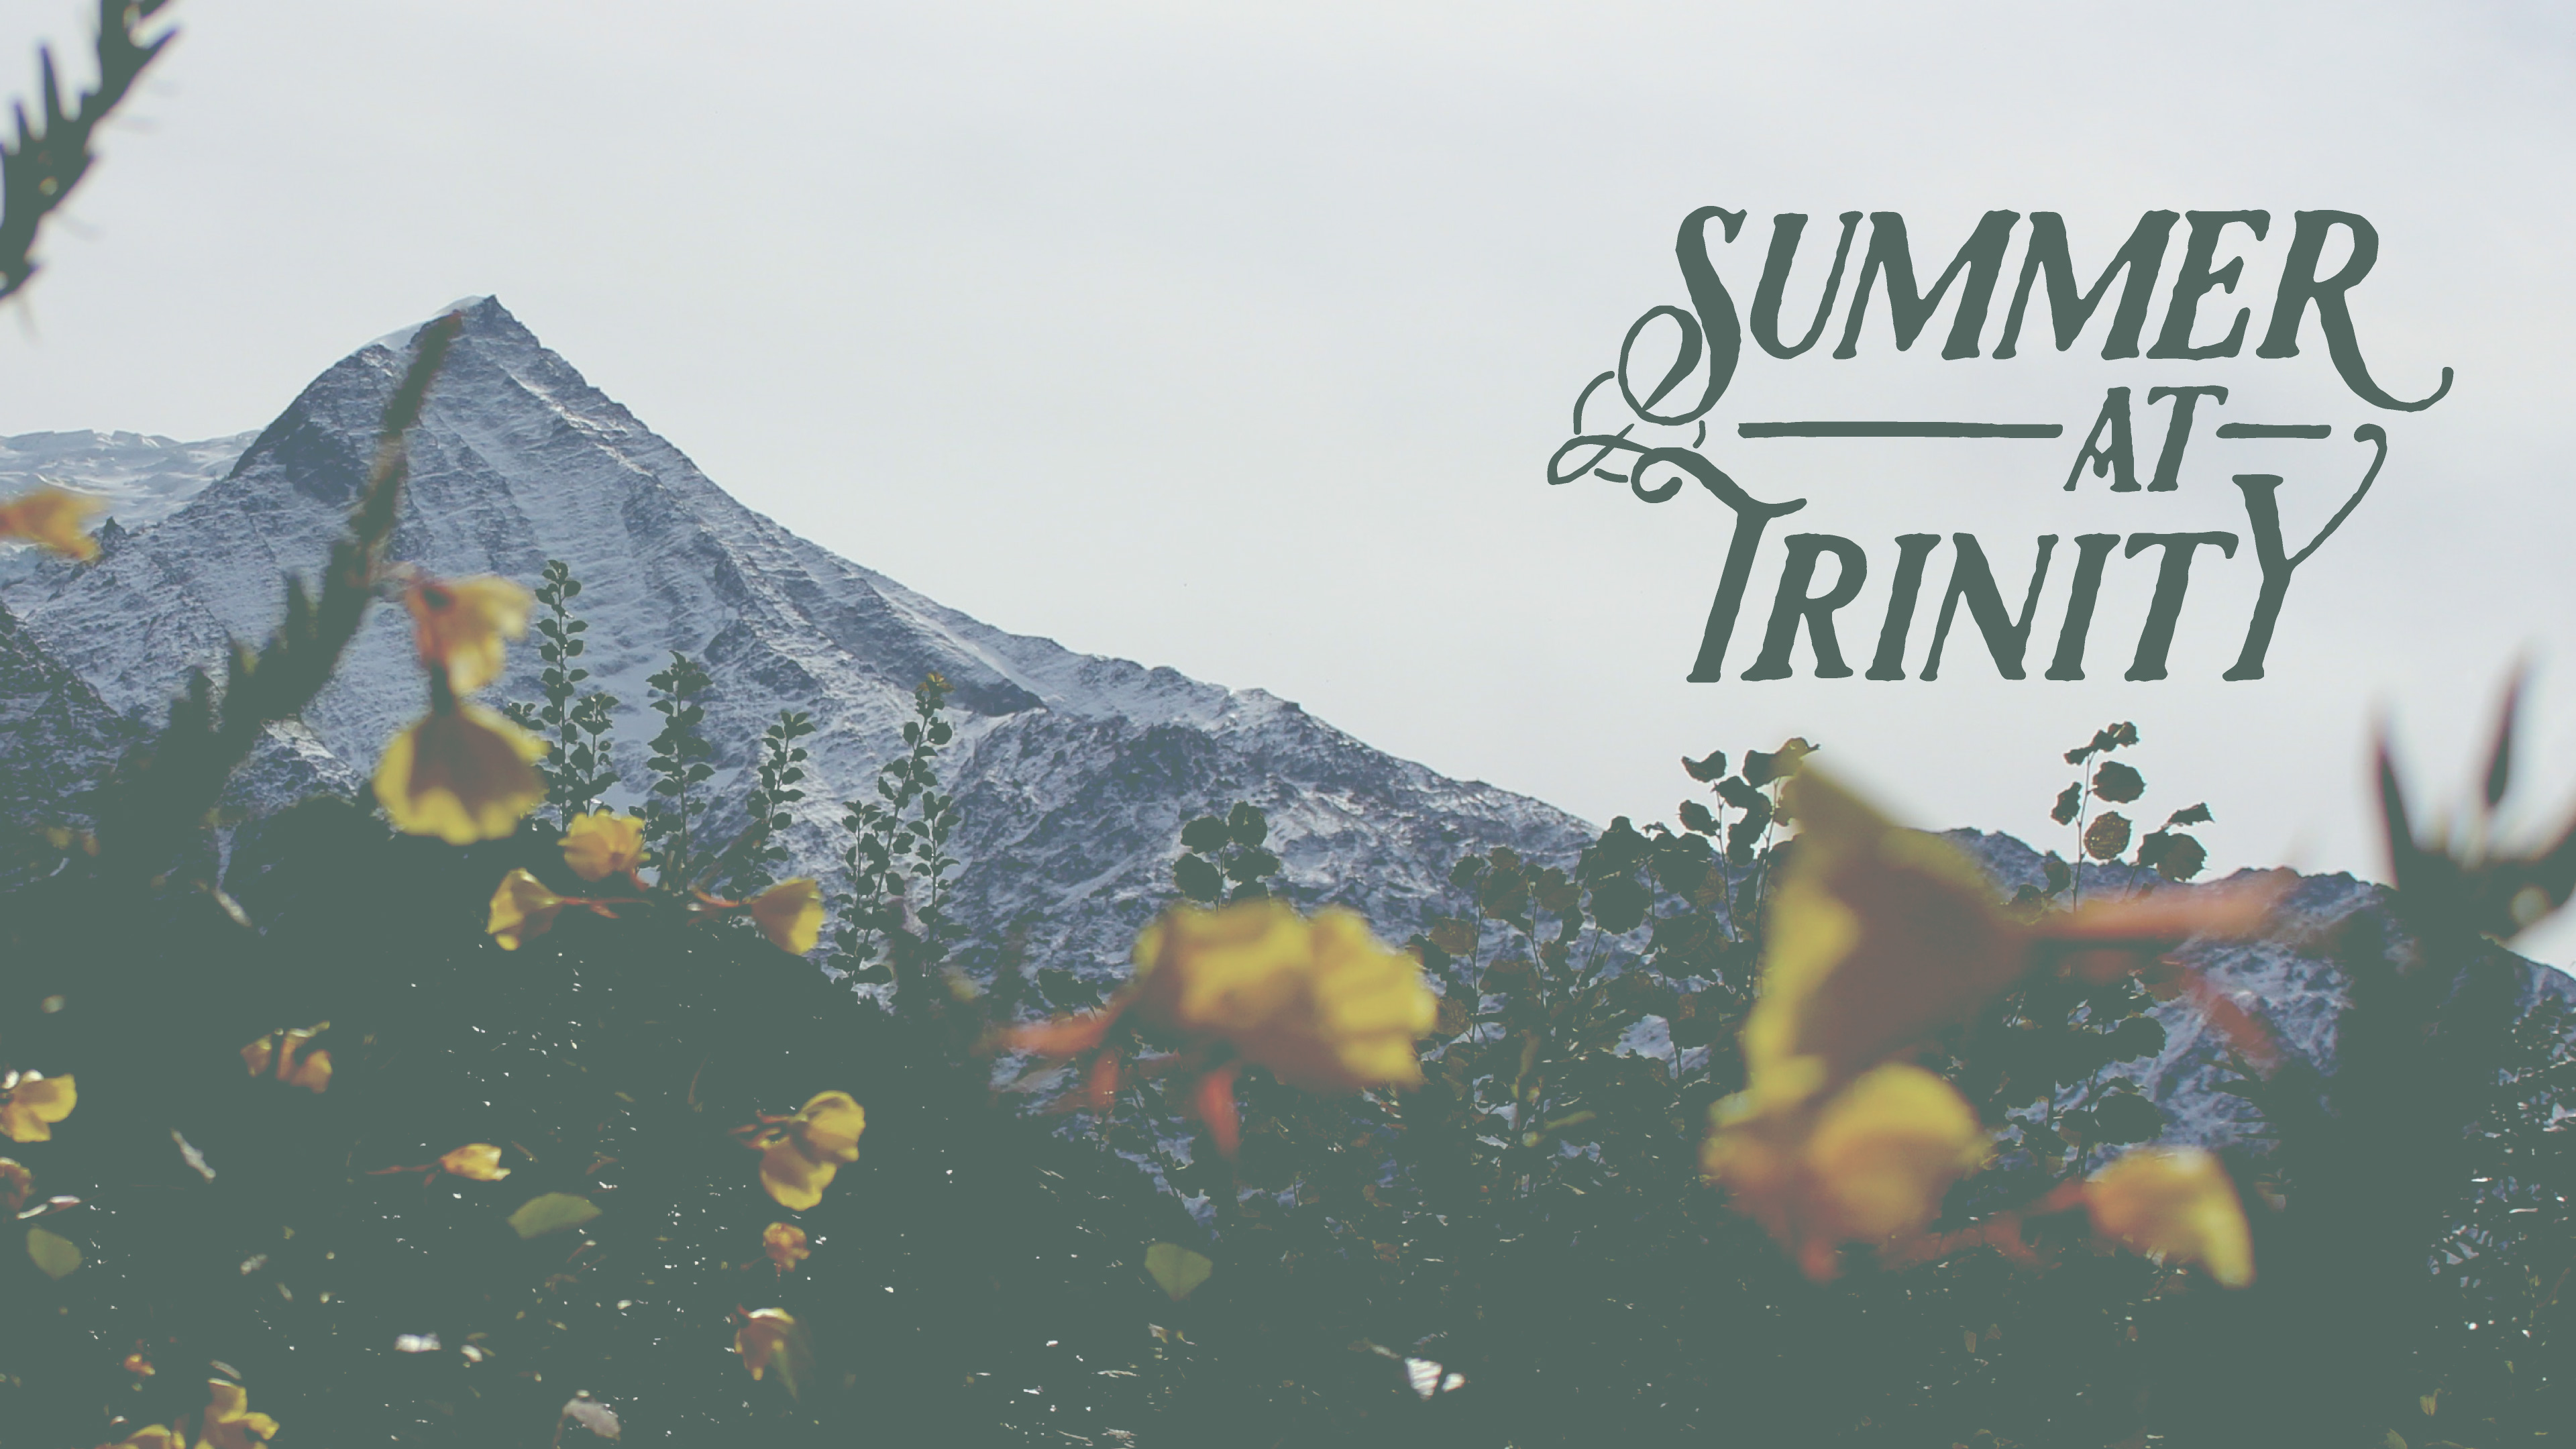 Summer at Trinity